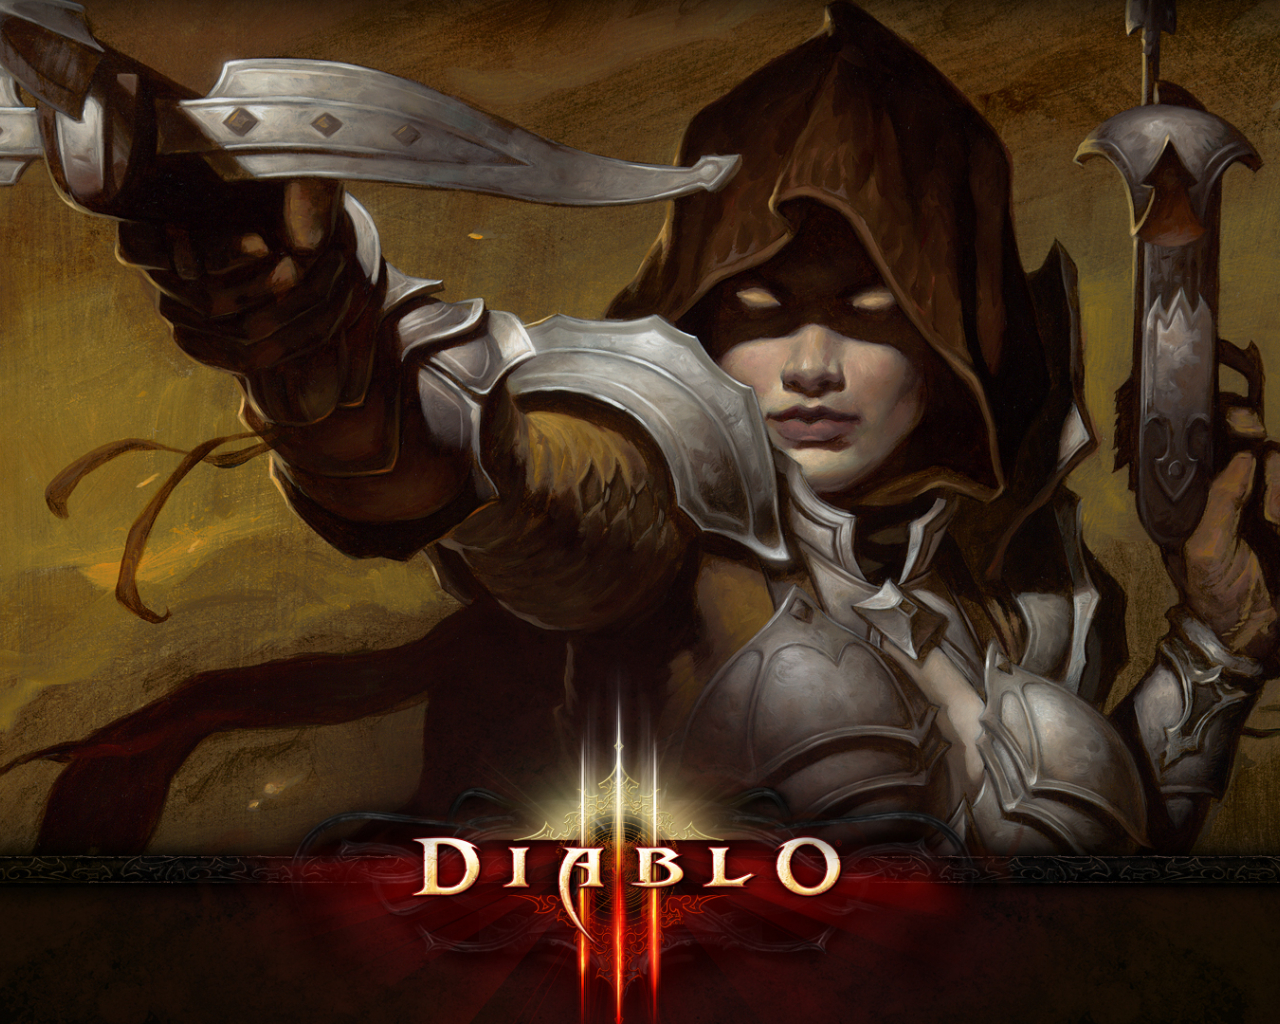 Free Download Diablo 3 Demon Hunter Wallpaper 877145 1920x1080